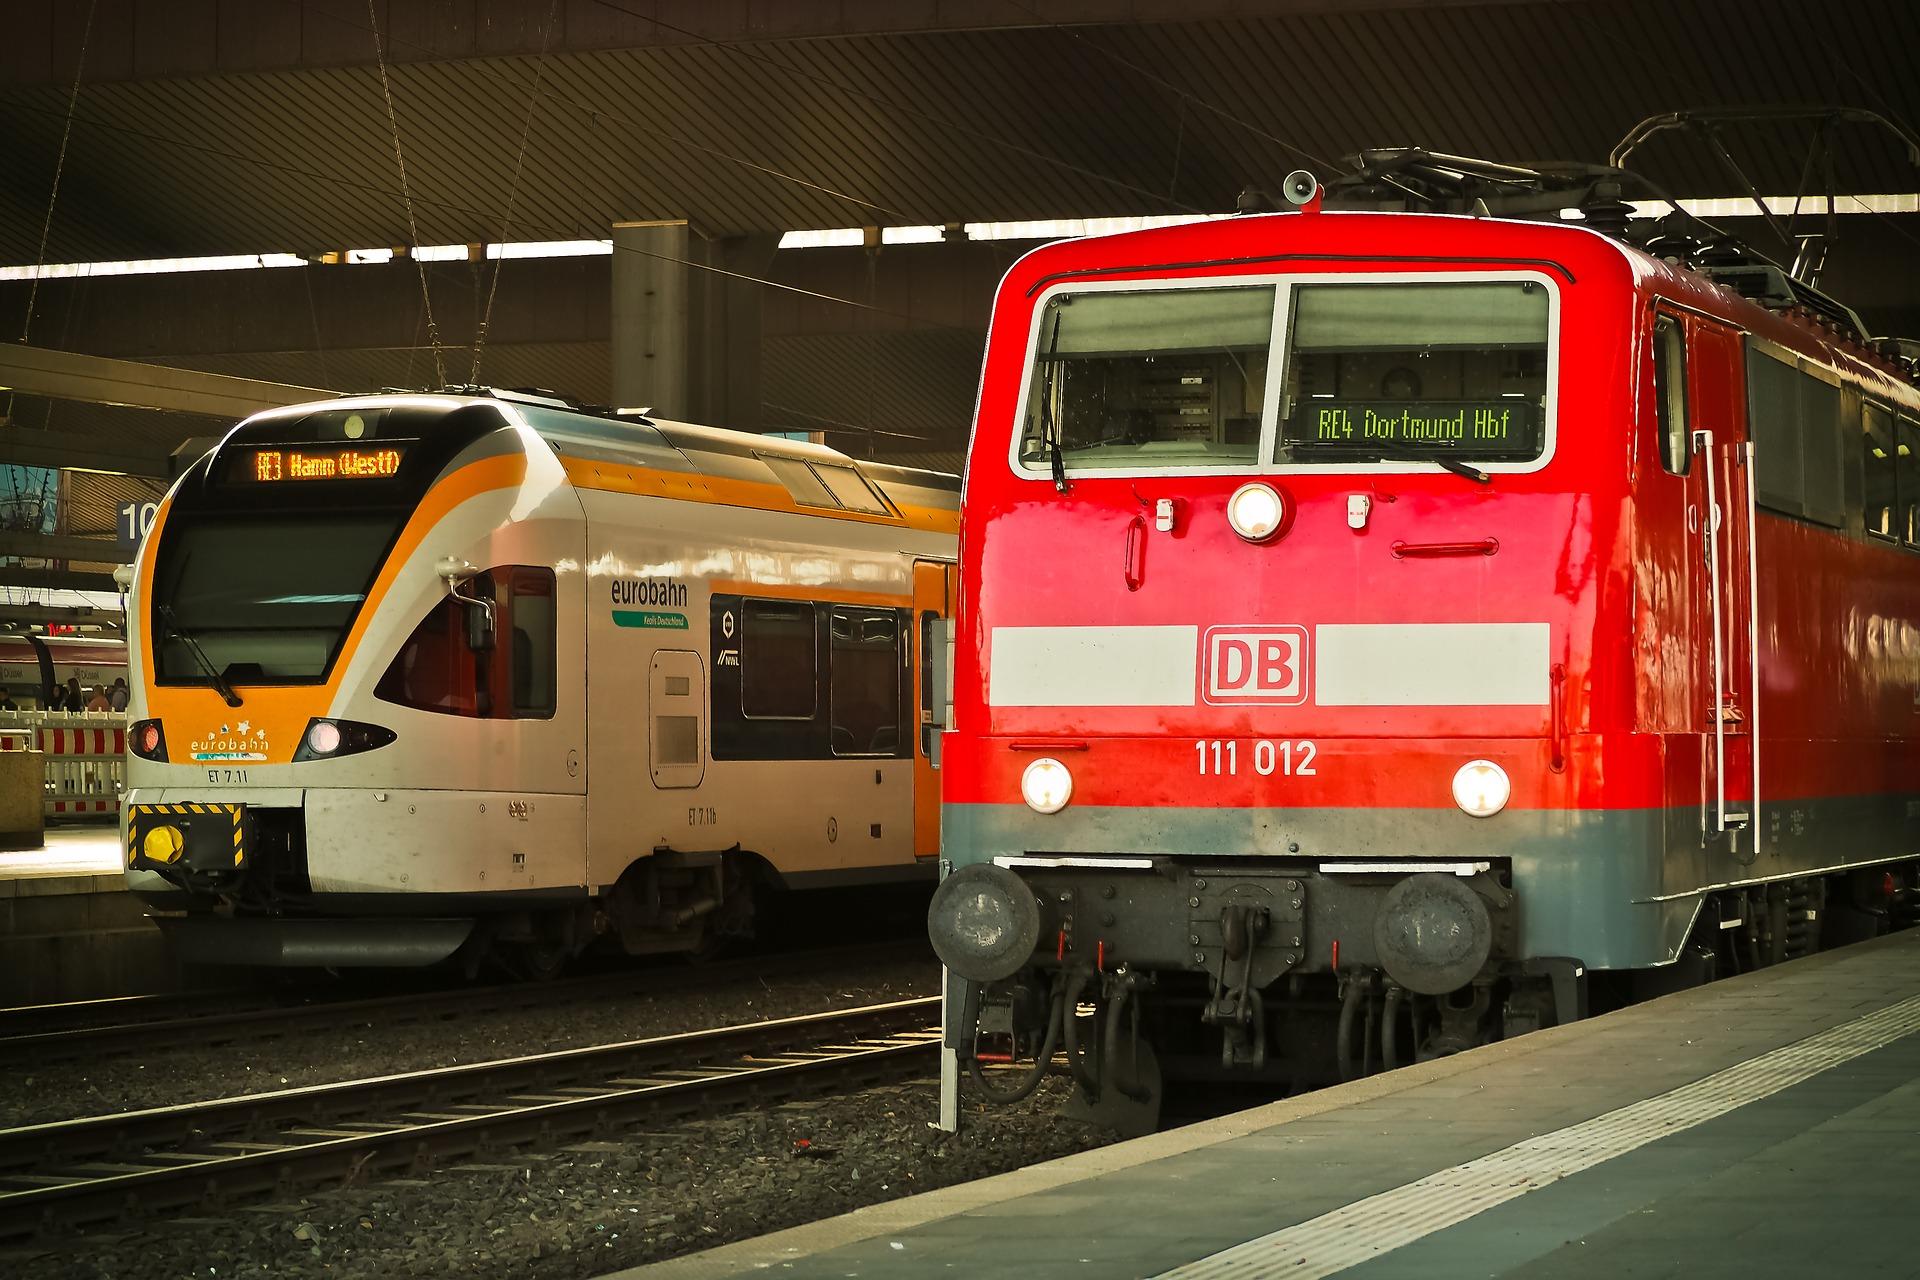 Railway transport